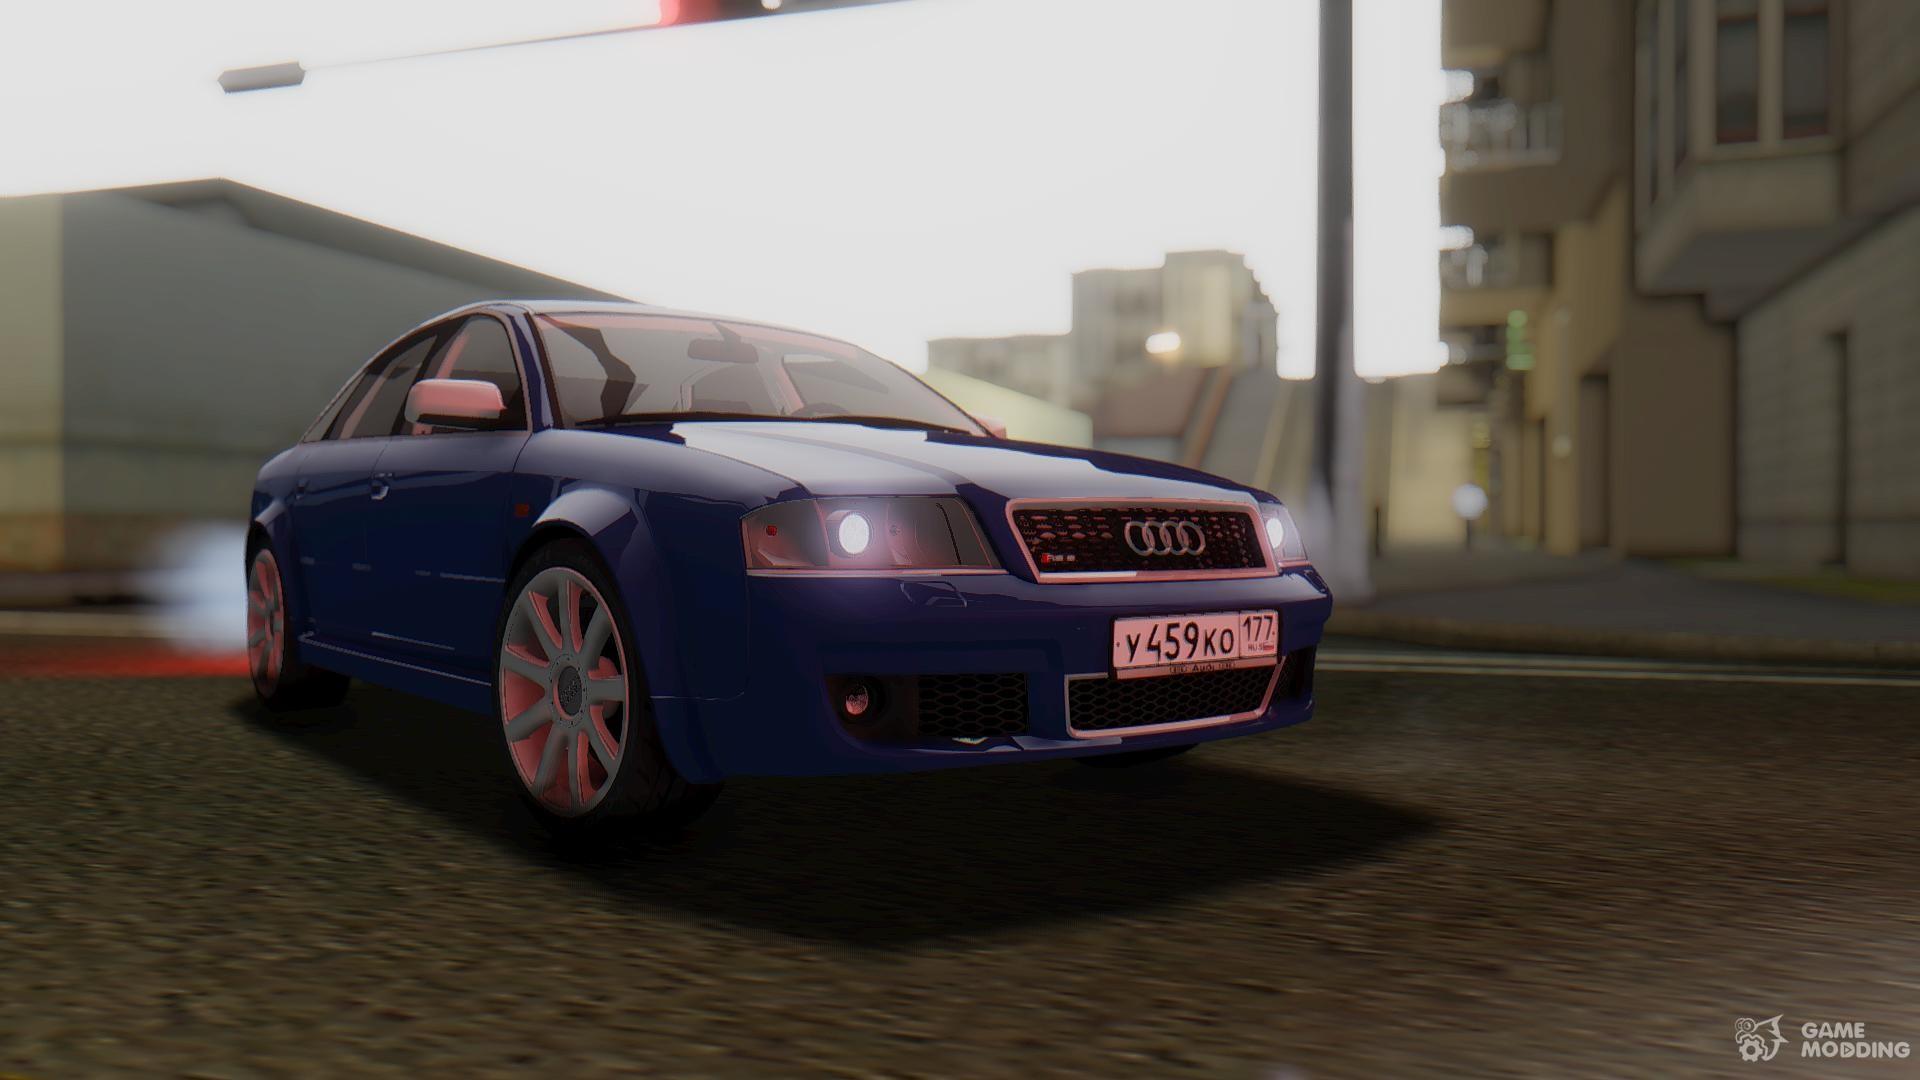 Audi for GTA San Andreas Audi Rs B on b5 audi a4 avant, b5 audi a8, b5 audi rs4, b5 audi s6, b5 audi a3,